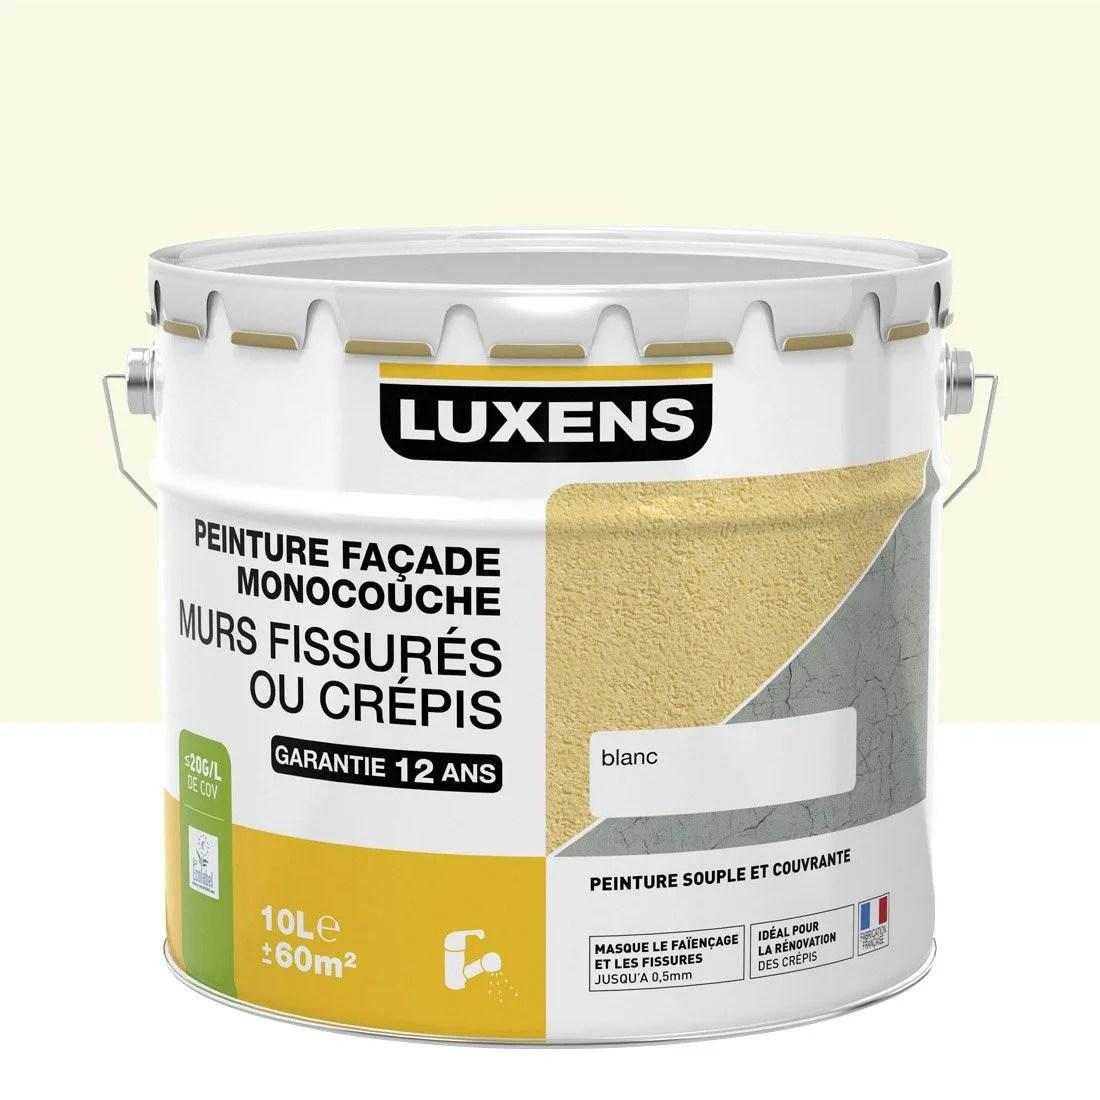 Peinture faade Murs fissurs LUXENS meulire 10 l  Leroy Merlin